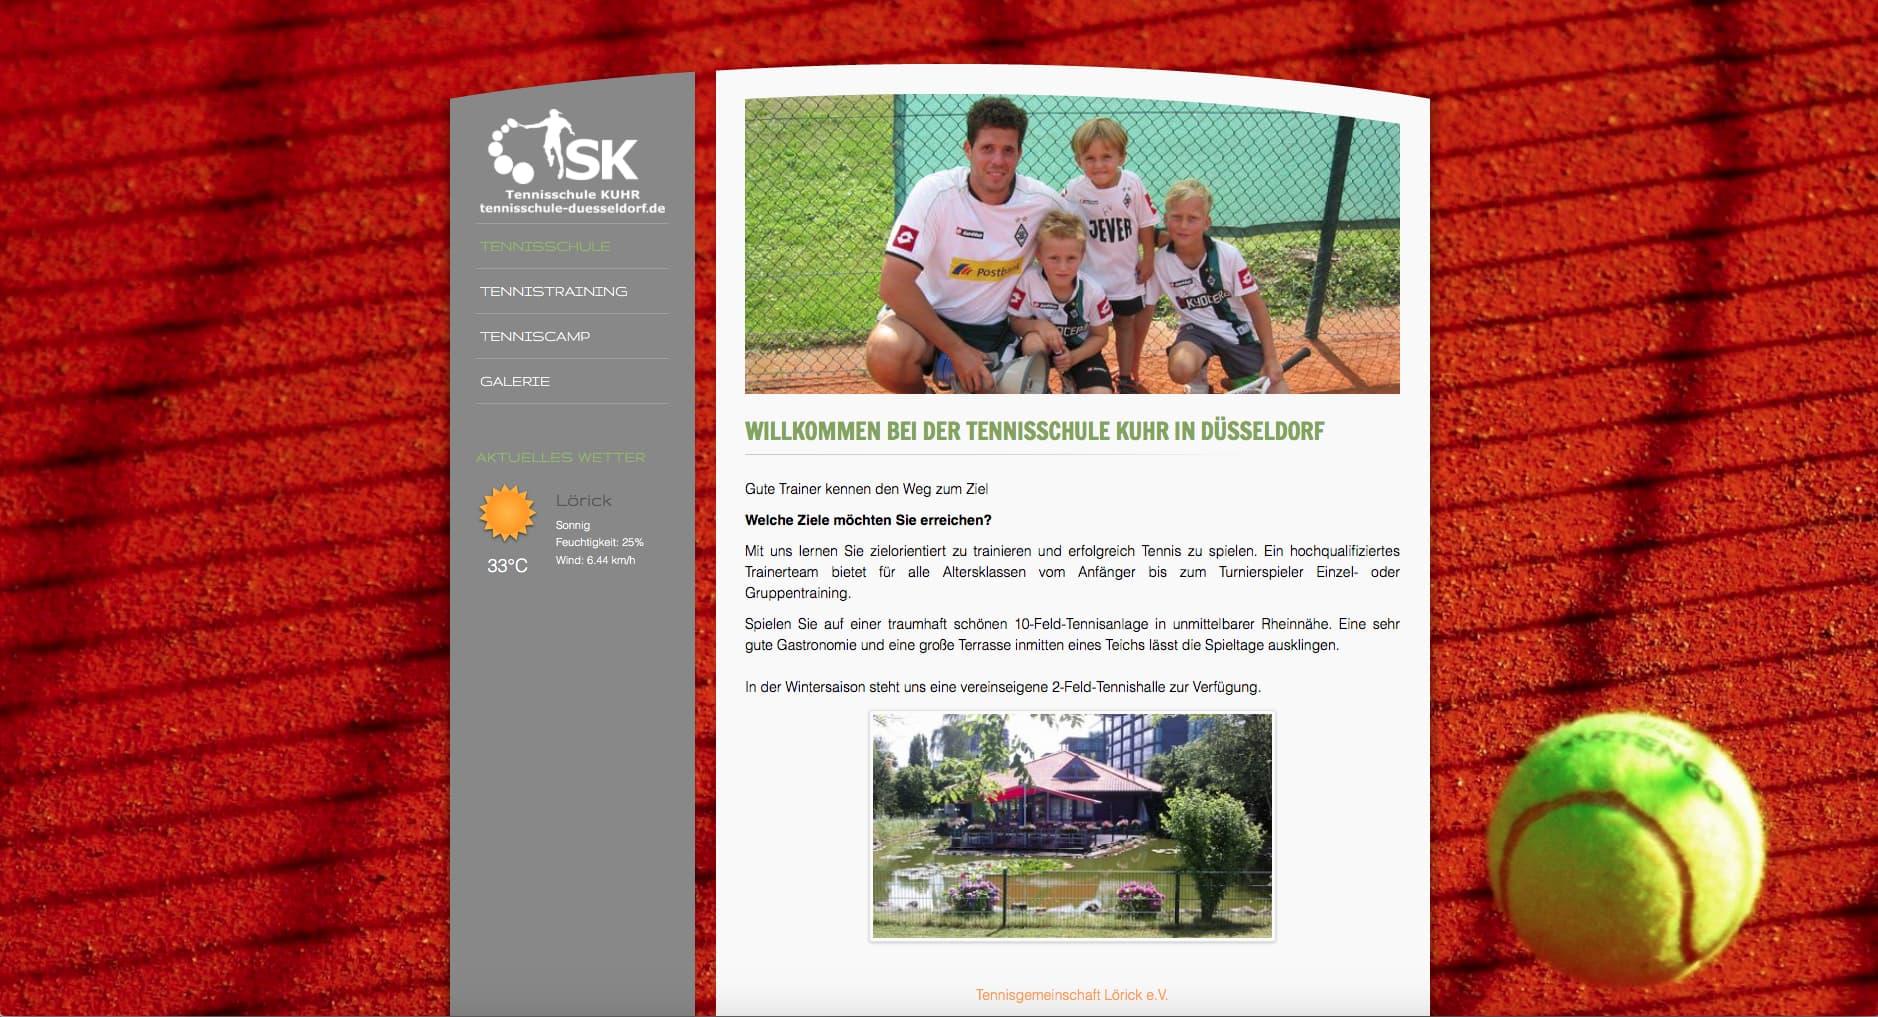 Tennisschule-Kuhr.de